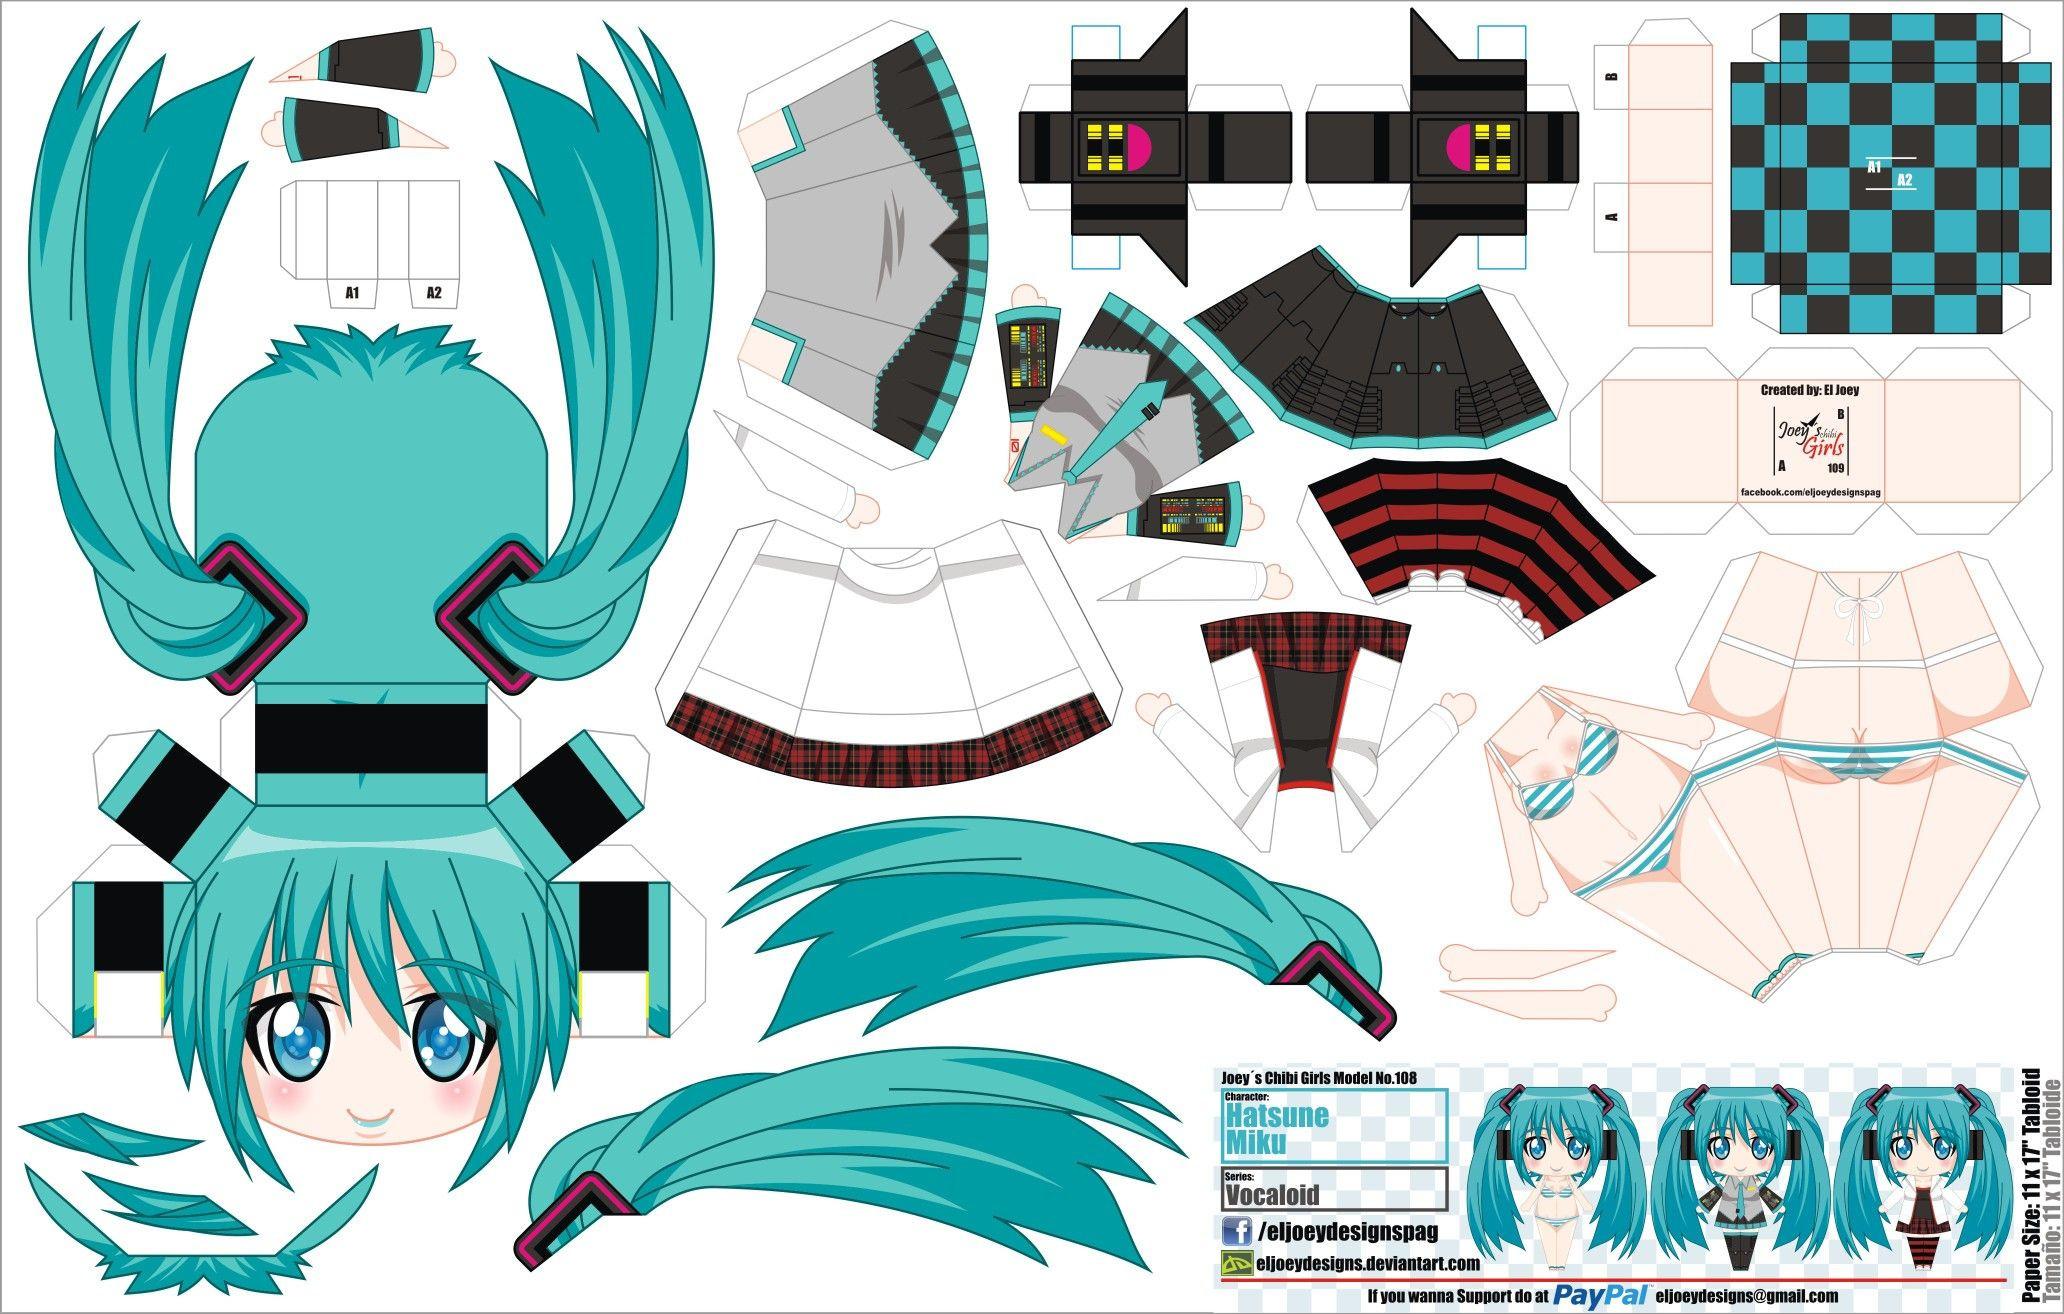 Hatsune Miku Papercraft Hatsune Miku Papercraft Template